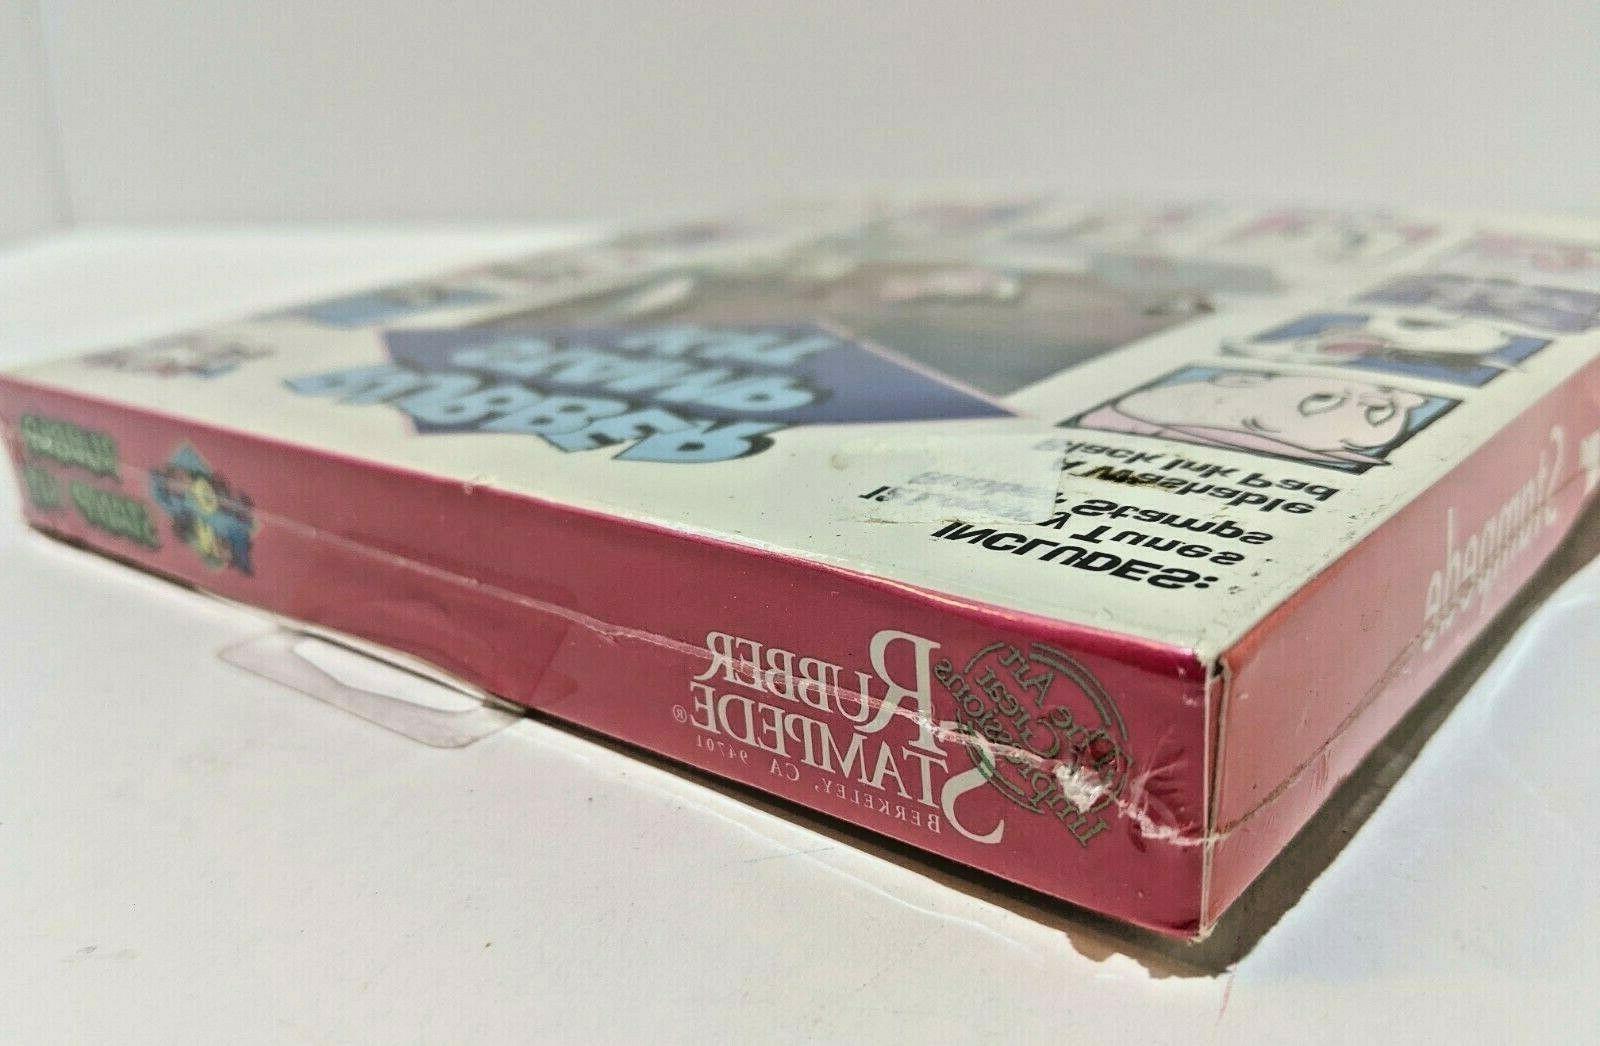 Vintage Looney Tunes Rubber Stamp Kit New Rubber Stampede